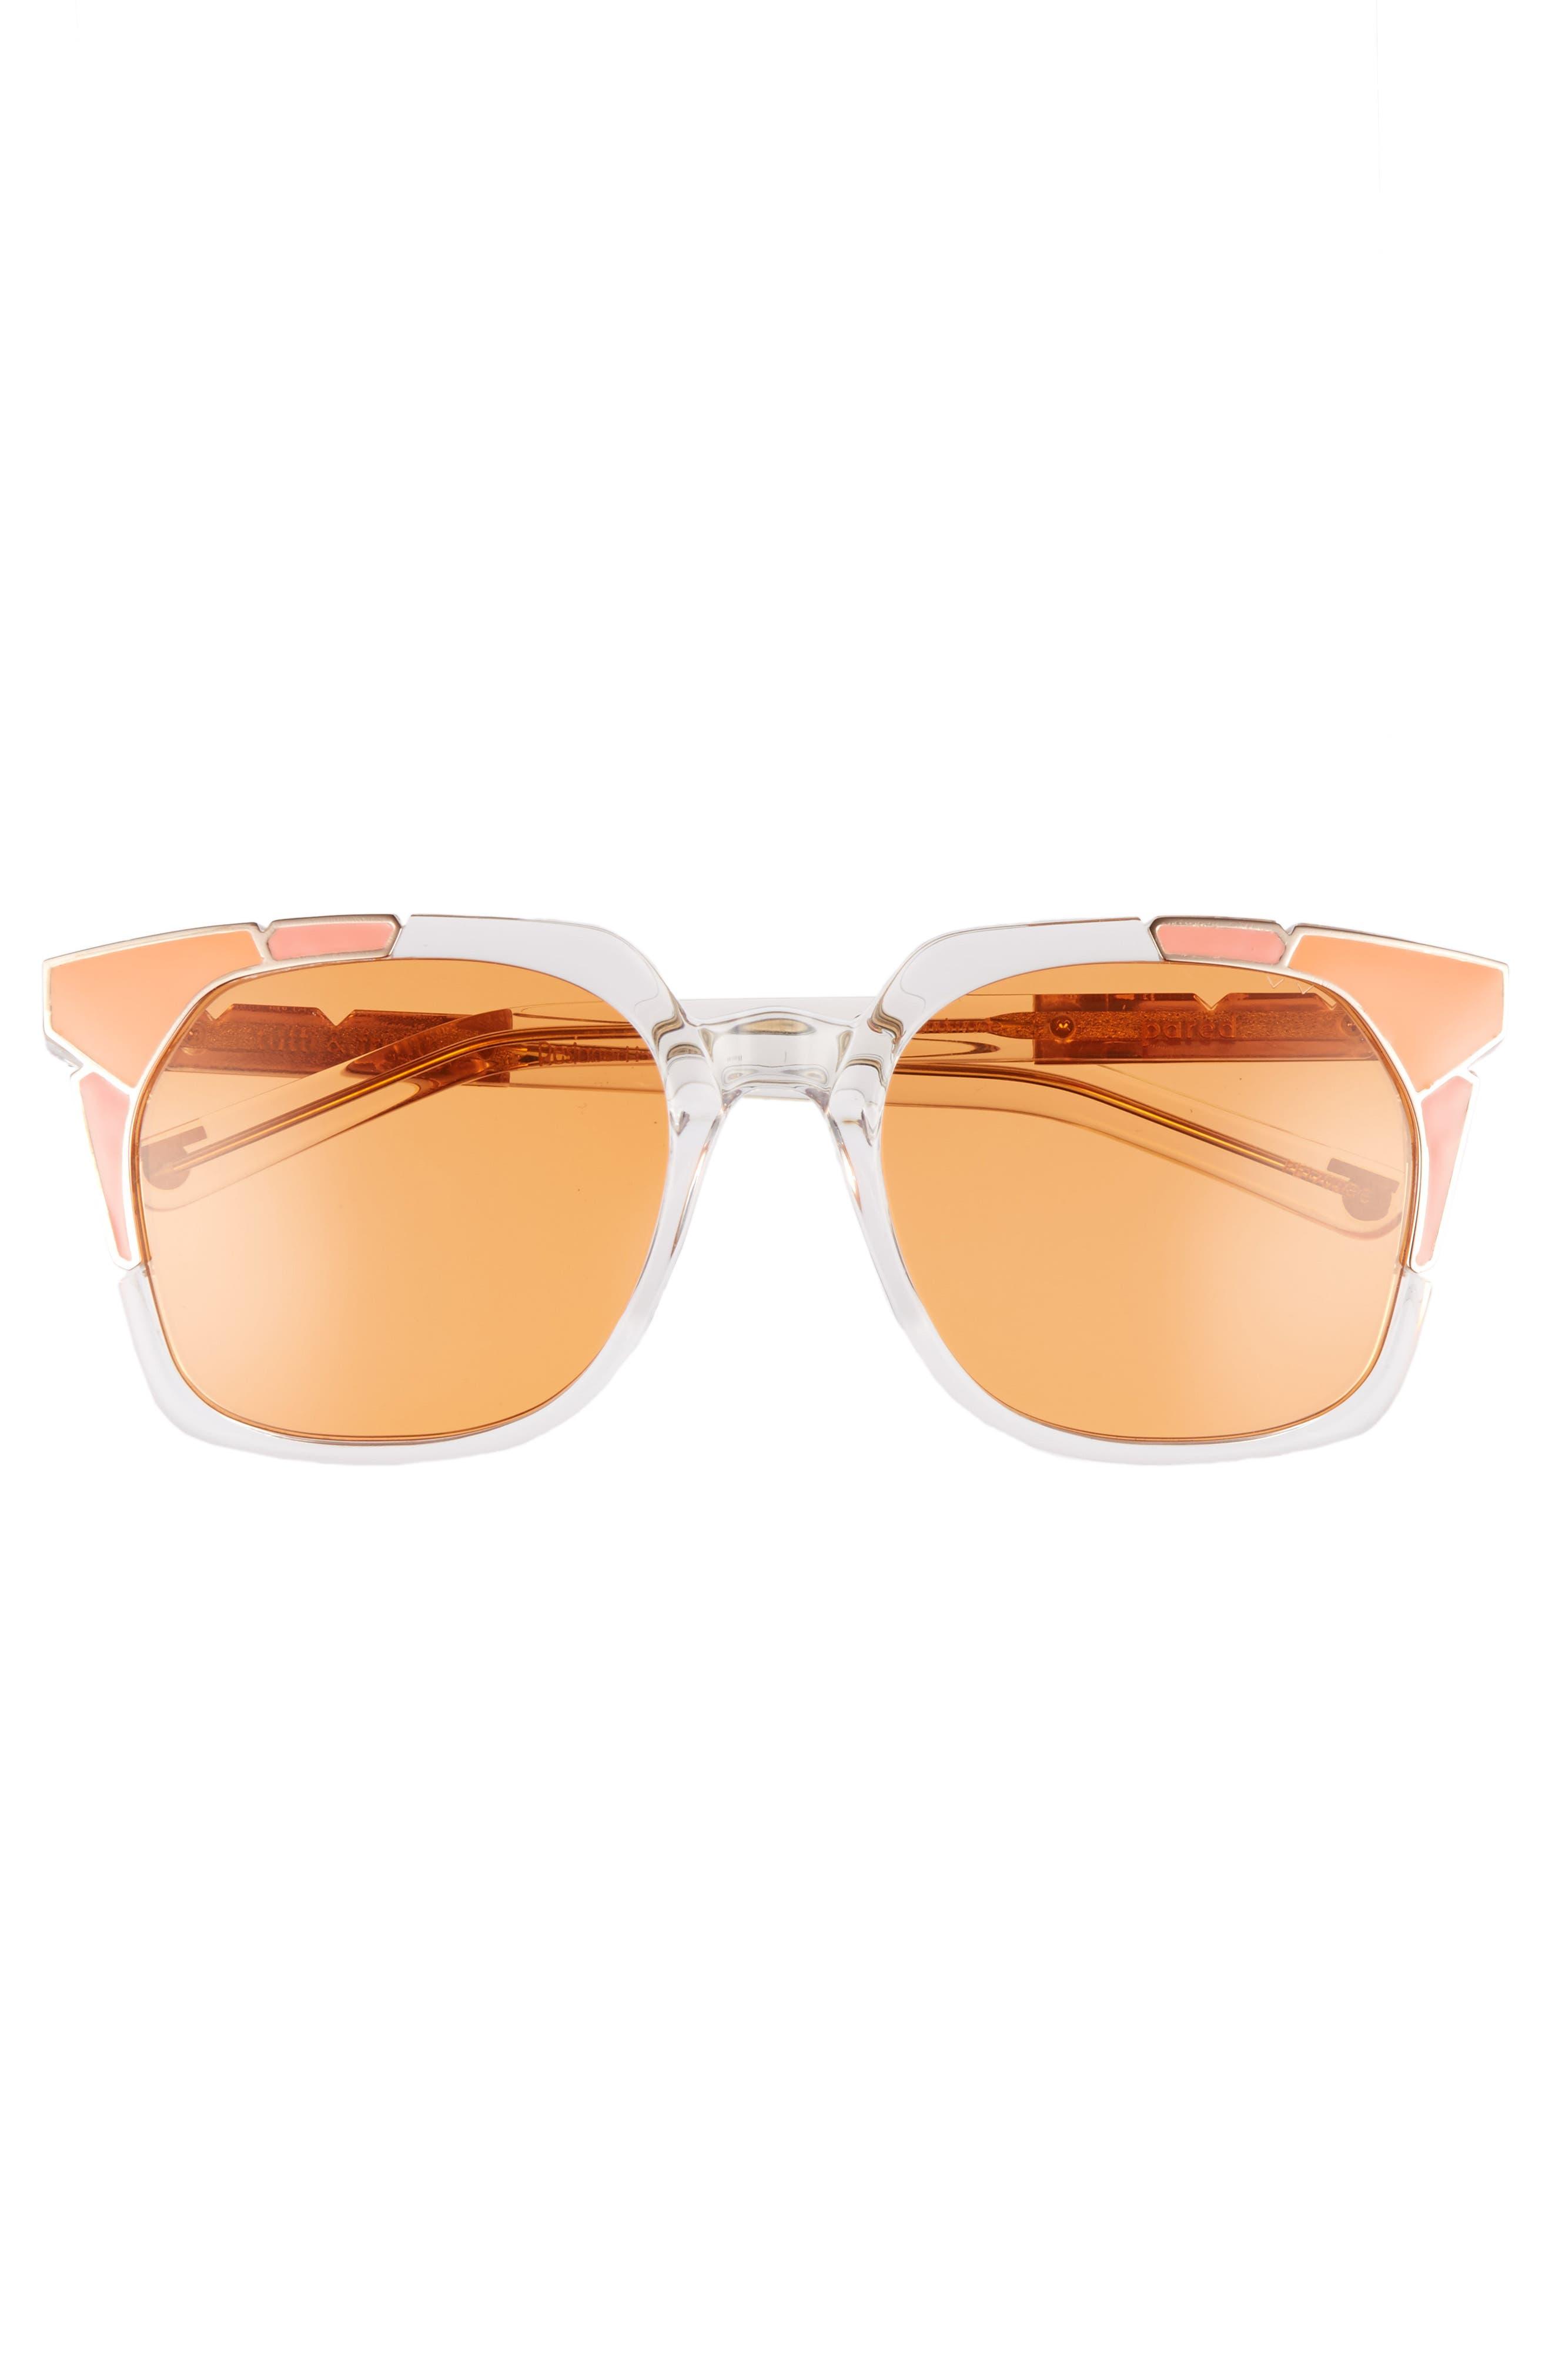 Tutti & Frutti 55mm Sunglasses,                             Alternate thumbnail 3, color,                             SALMON ORANGE/ ROSE GOLD